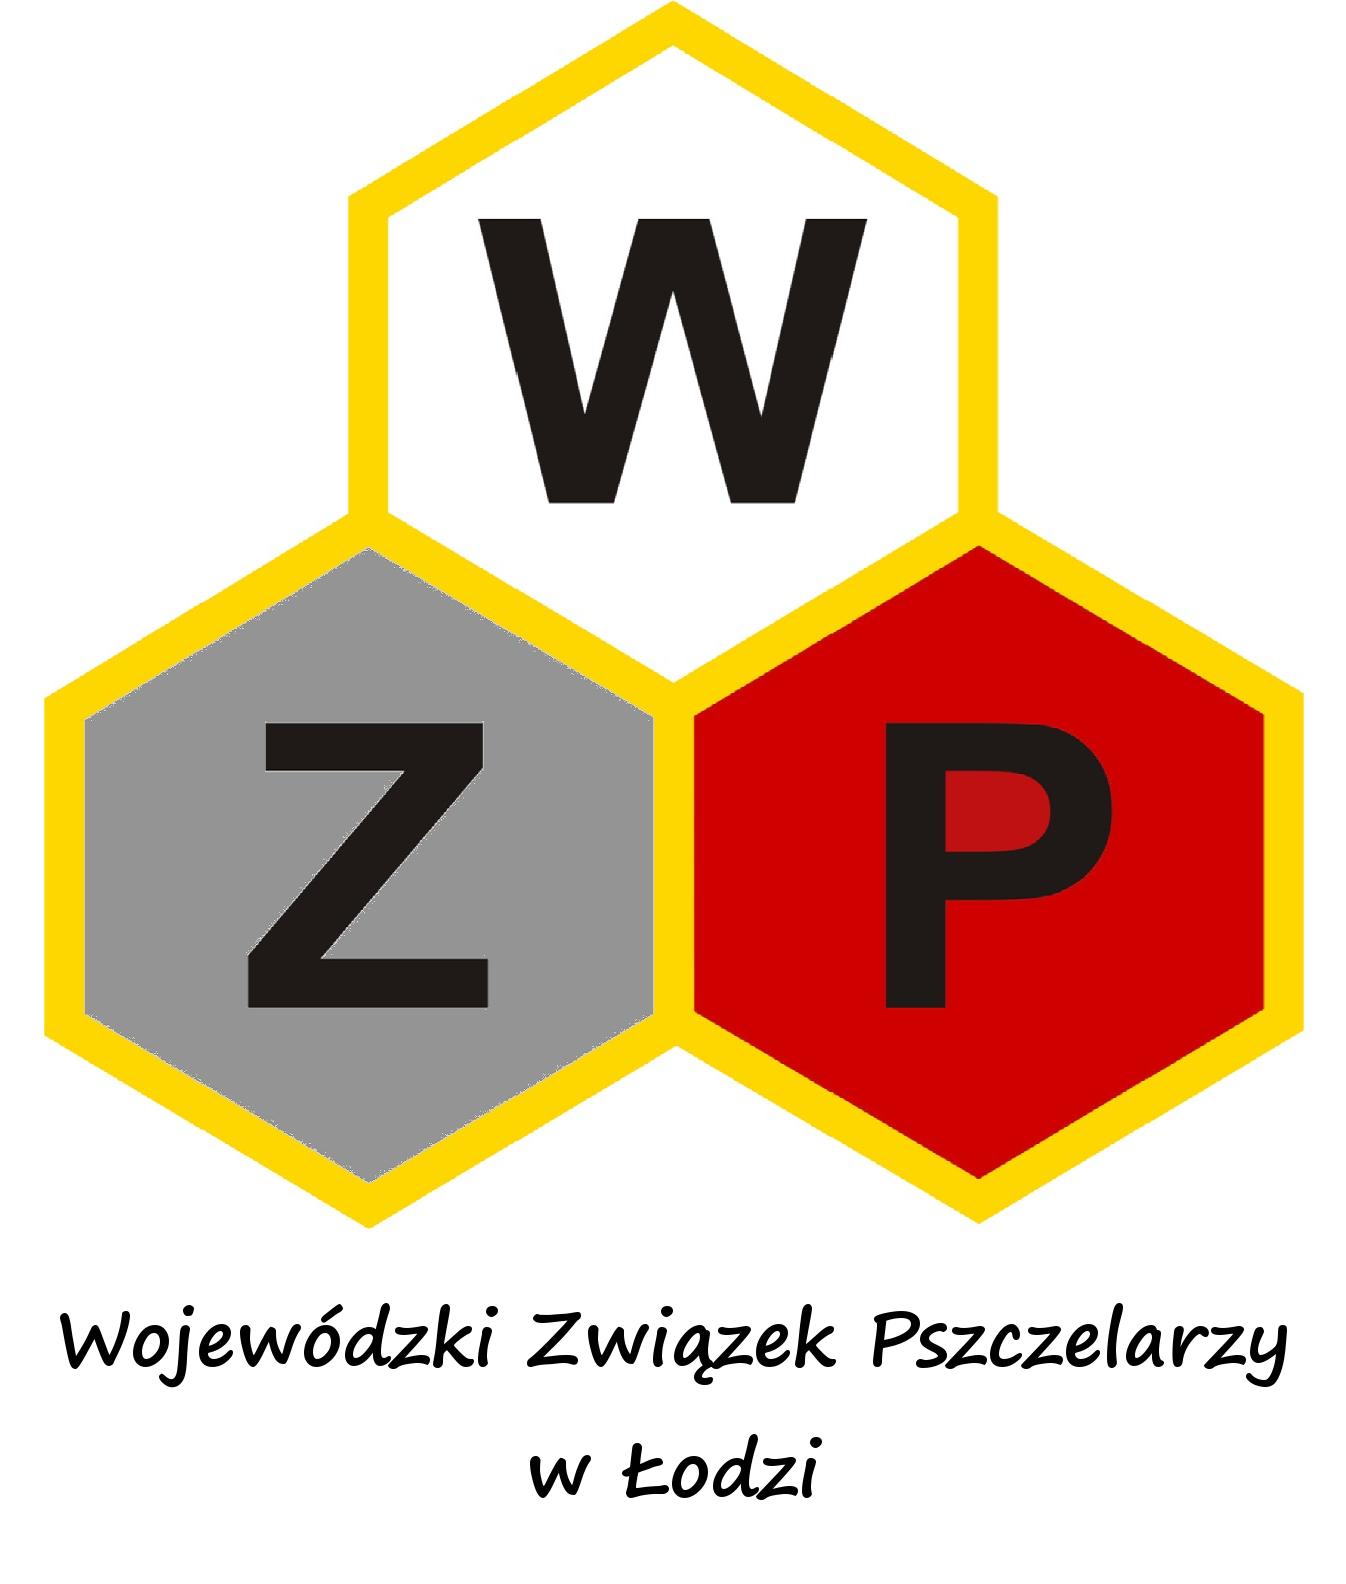 images/logo.jpg